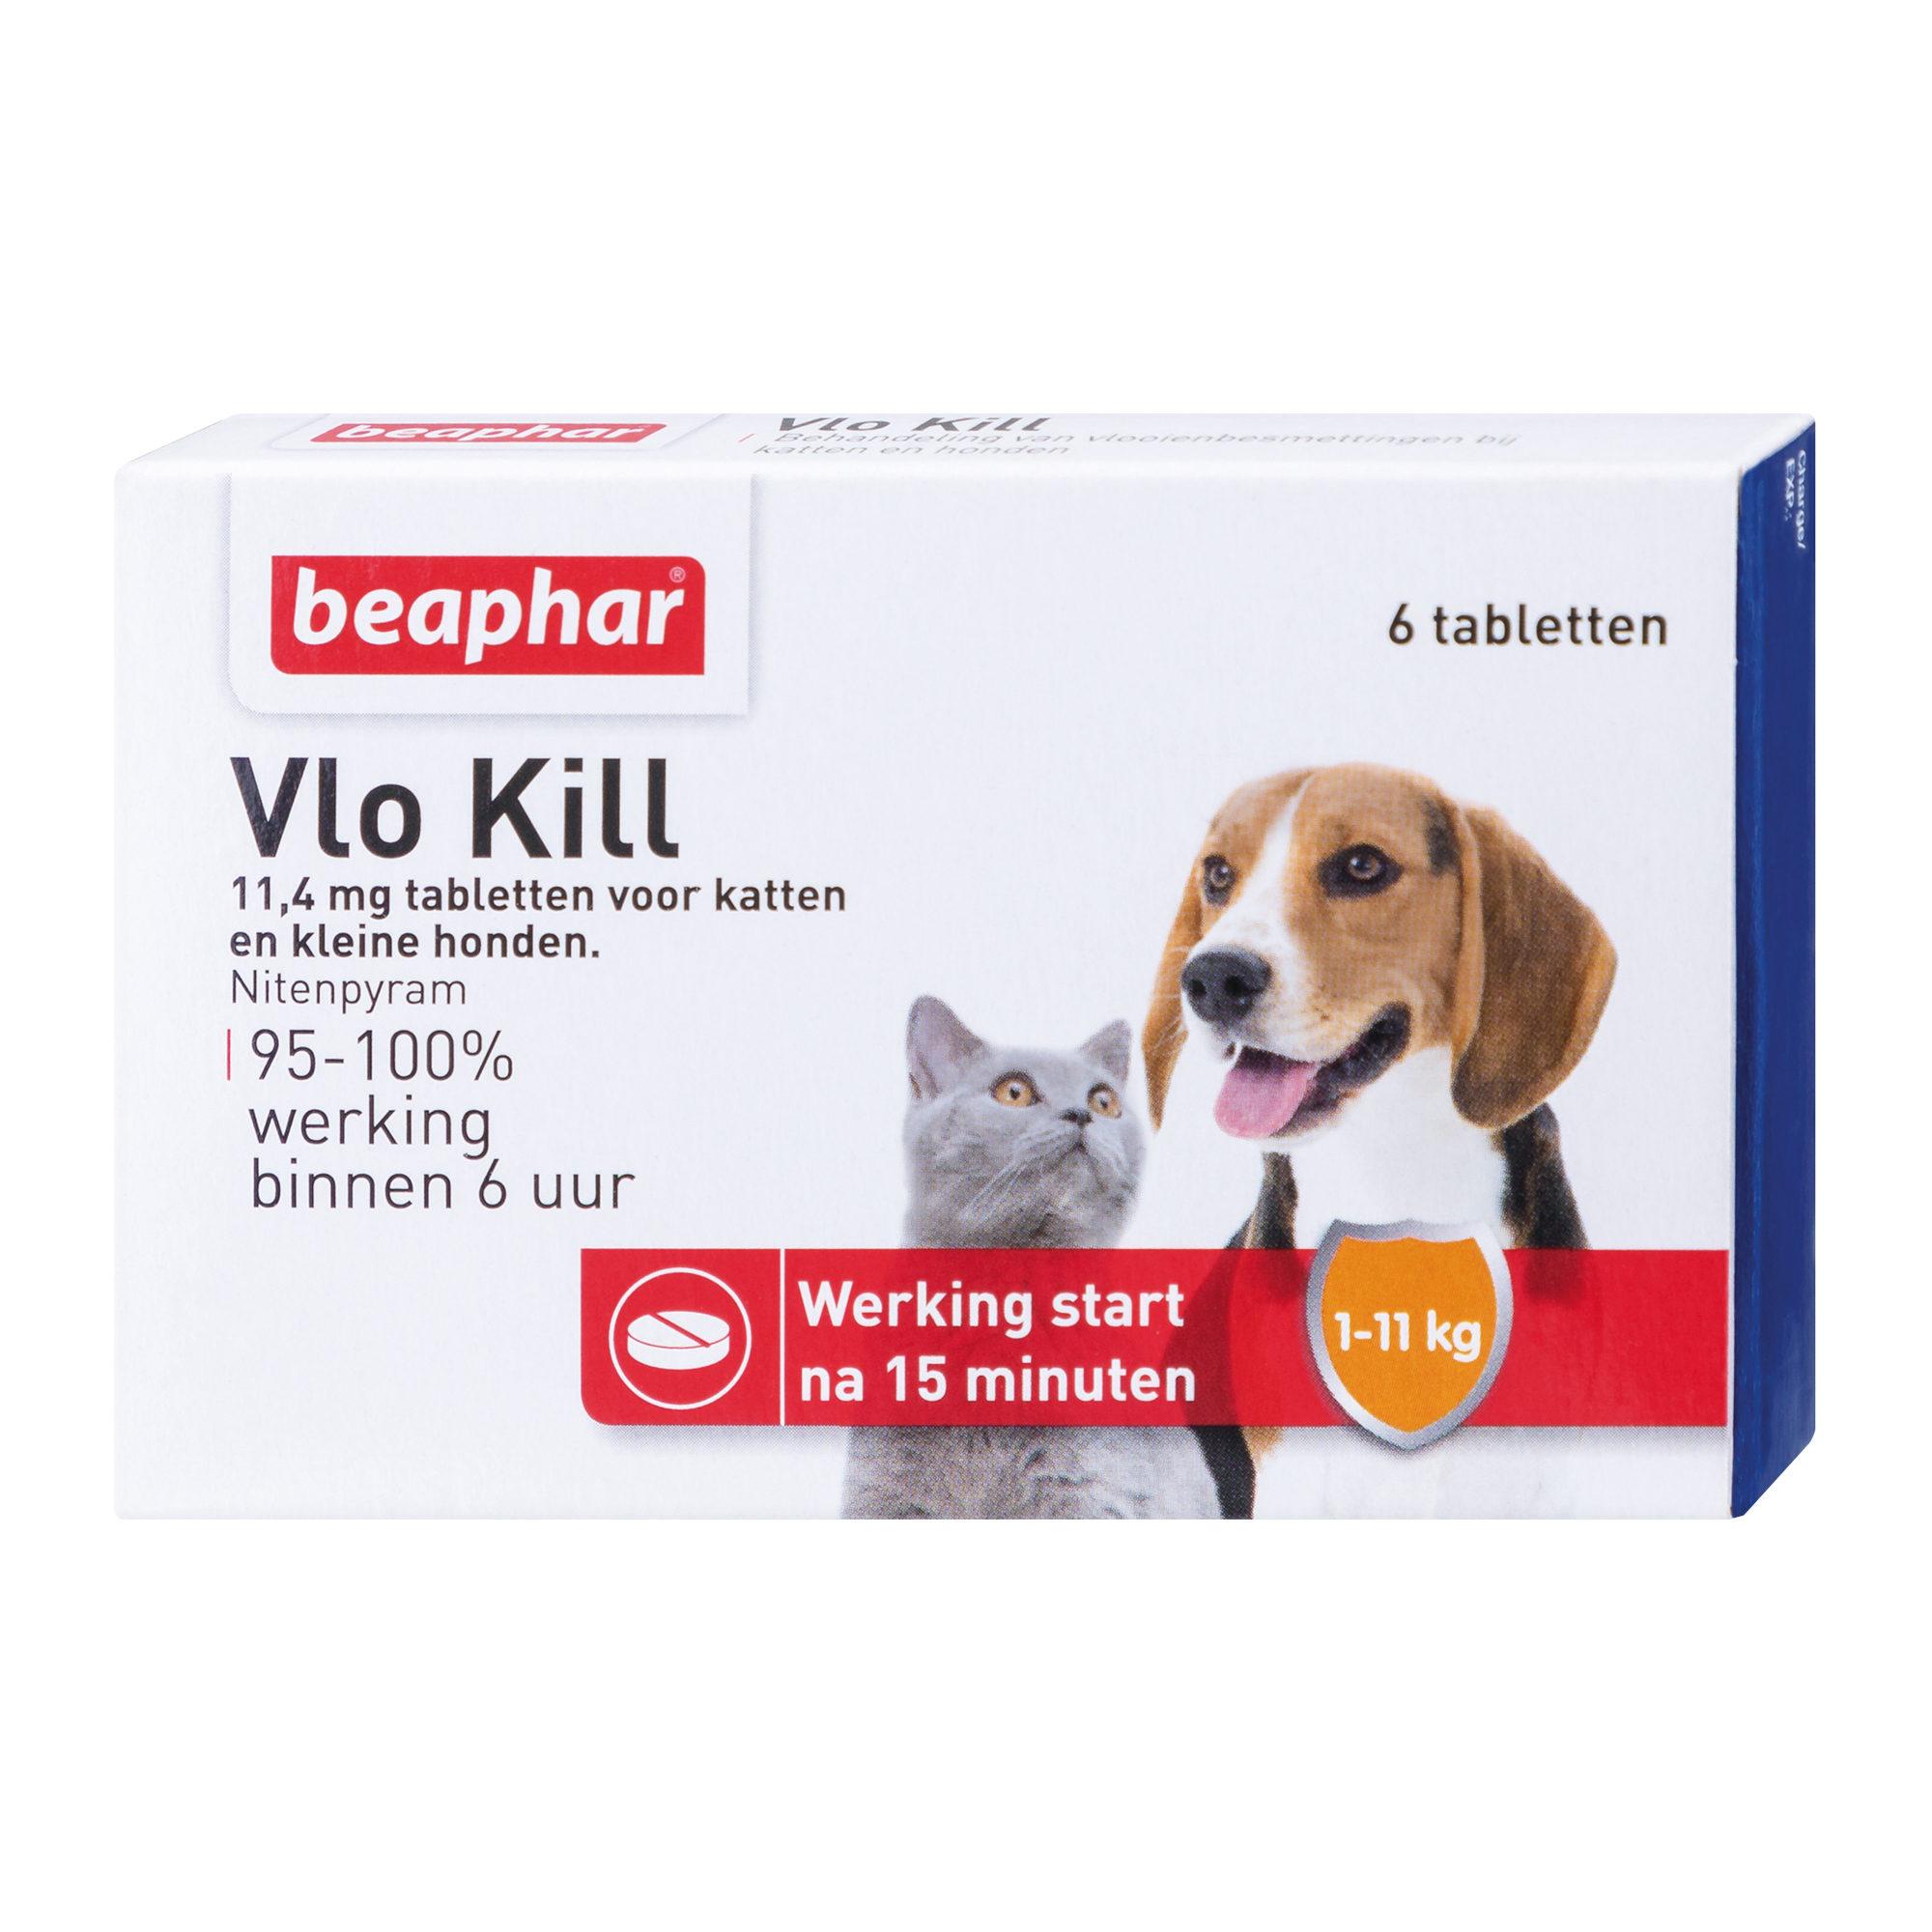 Beaphar Floh Kill+ - Katze & Hund bis 11 kg - 6 Tabletten